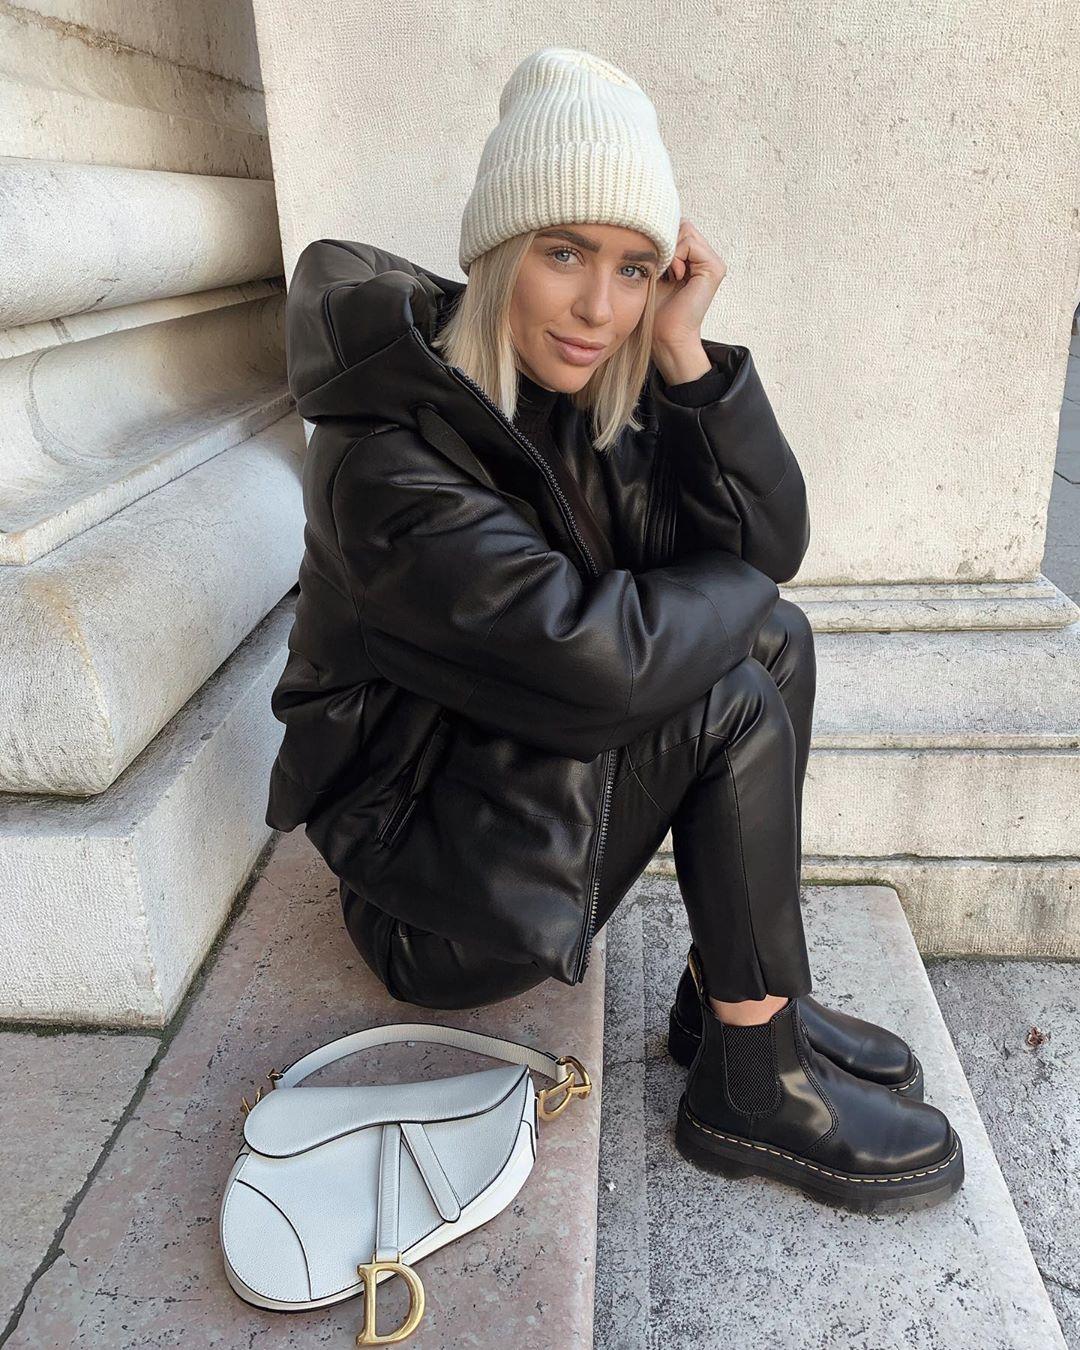 synthetic leather jacket de Zara sur valentina.steinhart